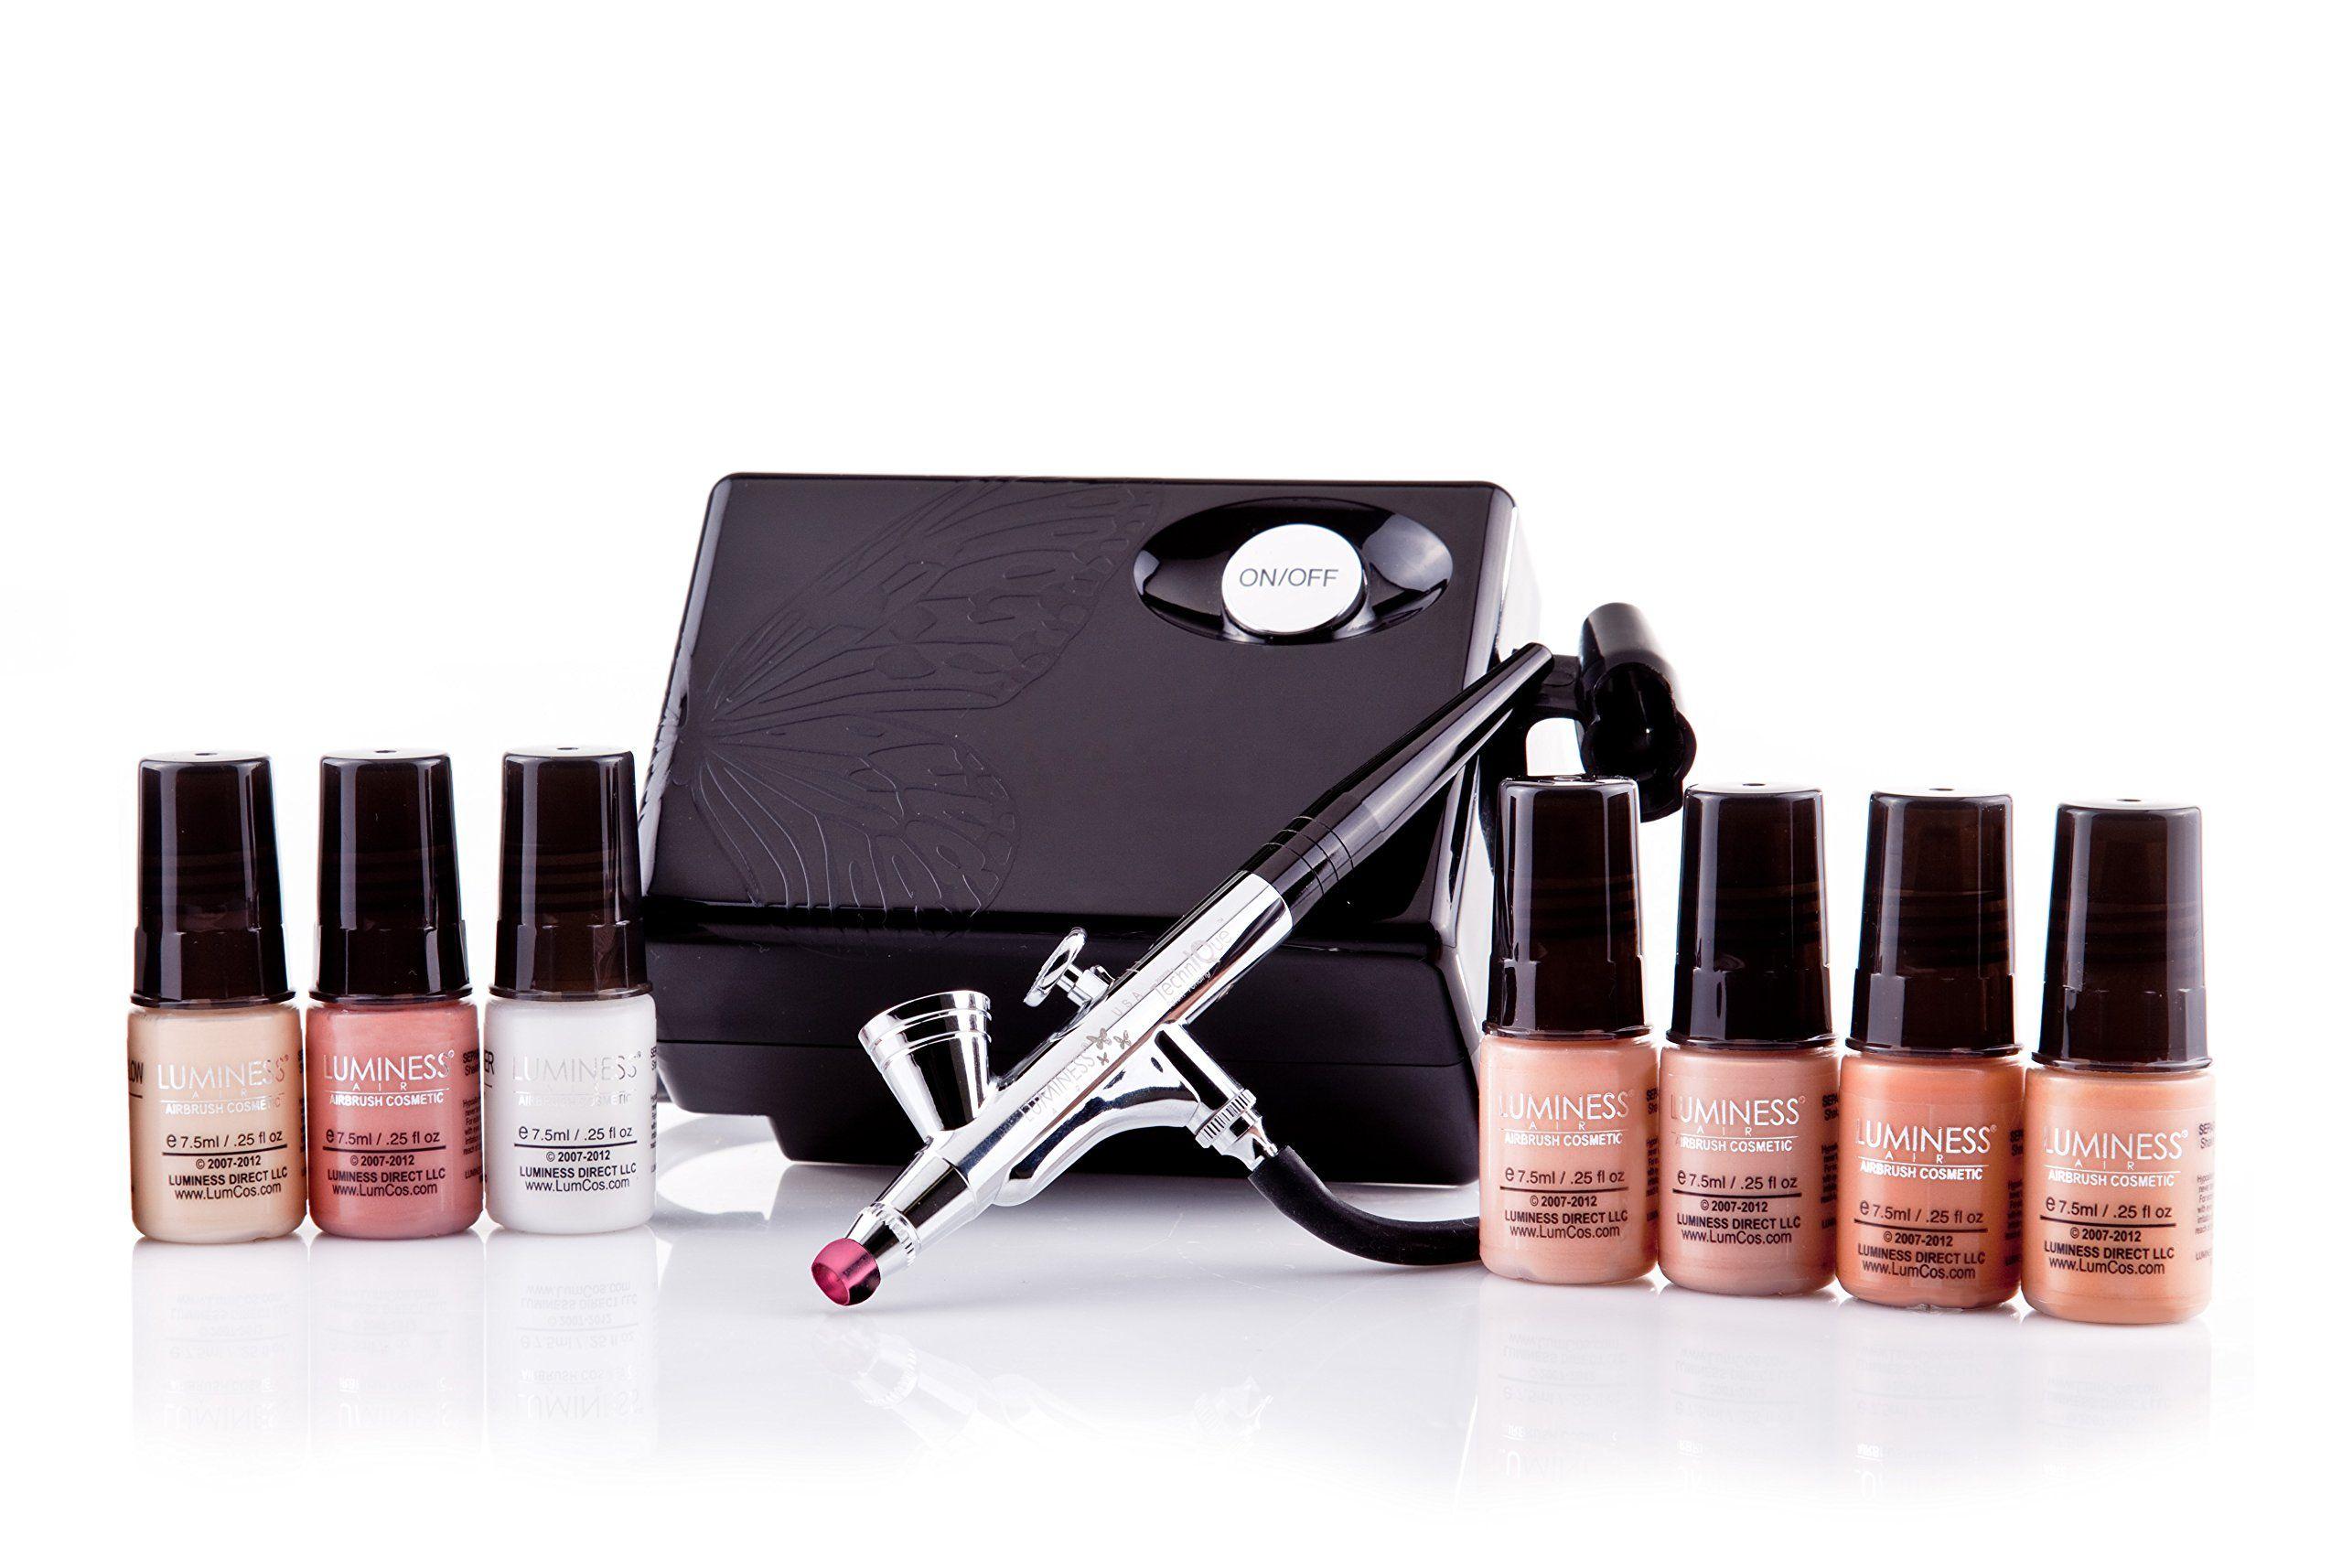 Luminess Air Airbrush Makeup System Airbrush Foundation Cosmetics It Cosmetics Foundation Airbrush Makeup Kit Airbrush Makeup Foundation